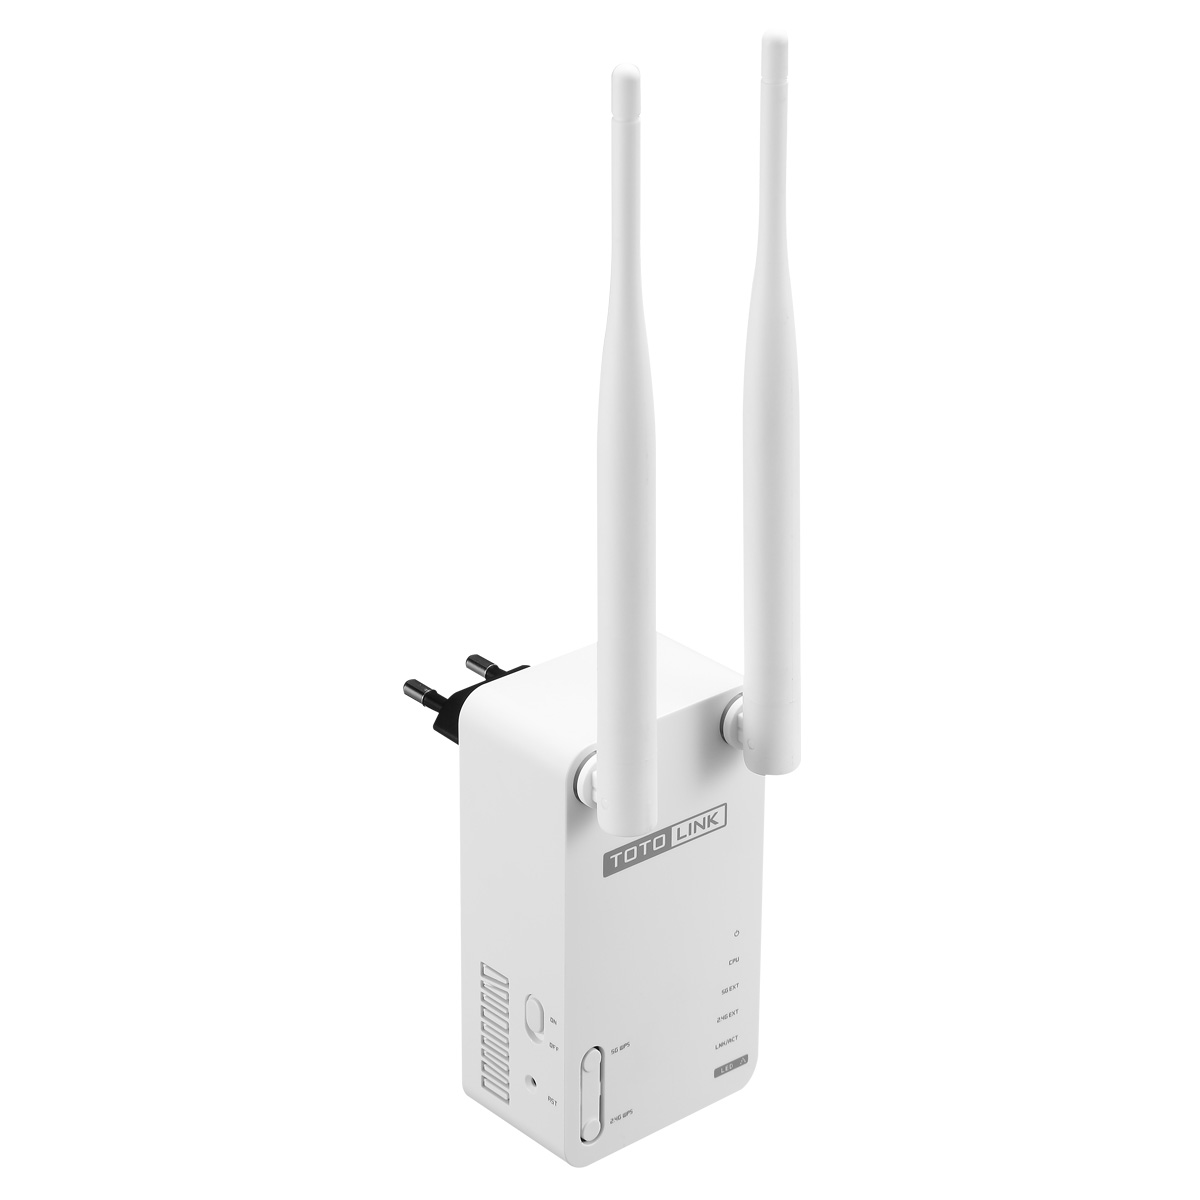 Products Totolink Help Tech Co Ltd N150usm 150mbps Wireless N Mini Usb Adapter Ac750 Dual Band Range Extender Ex750